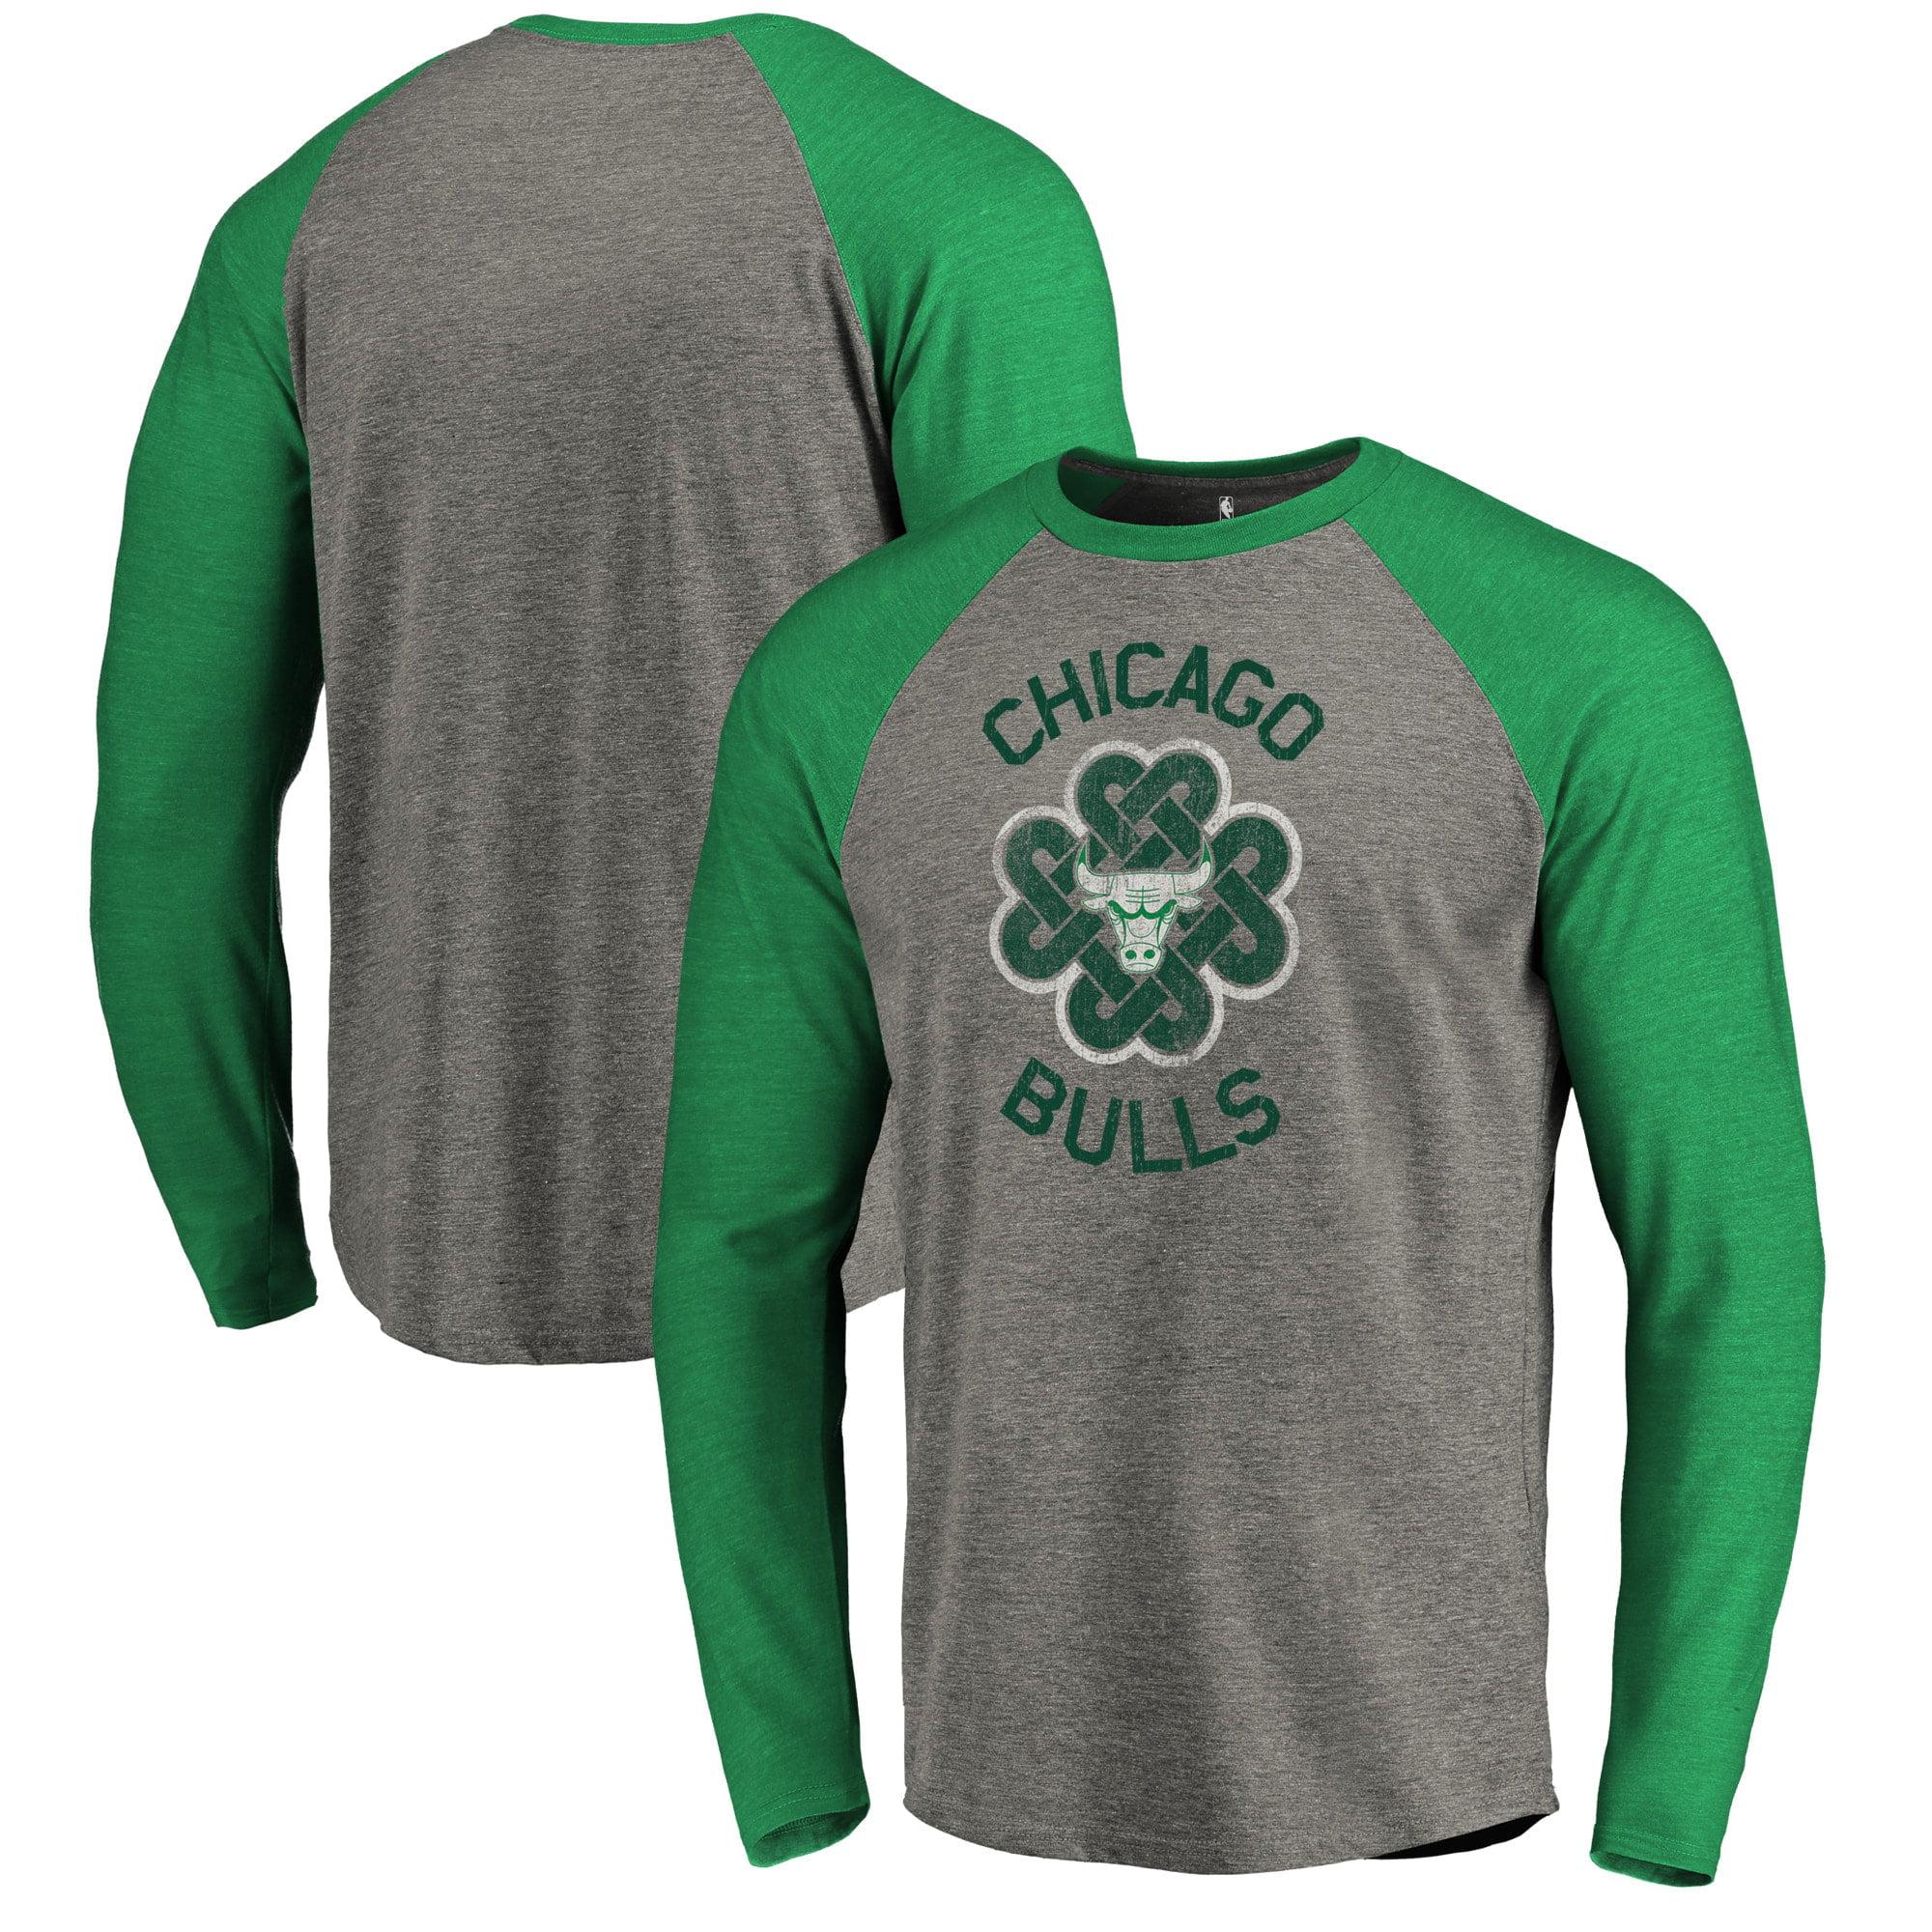 Seattle City Shamrock Tri-Blend V-Neck T-Shirt